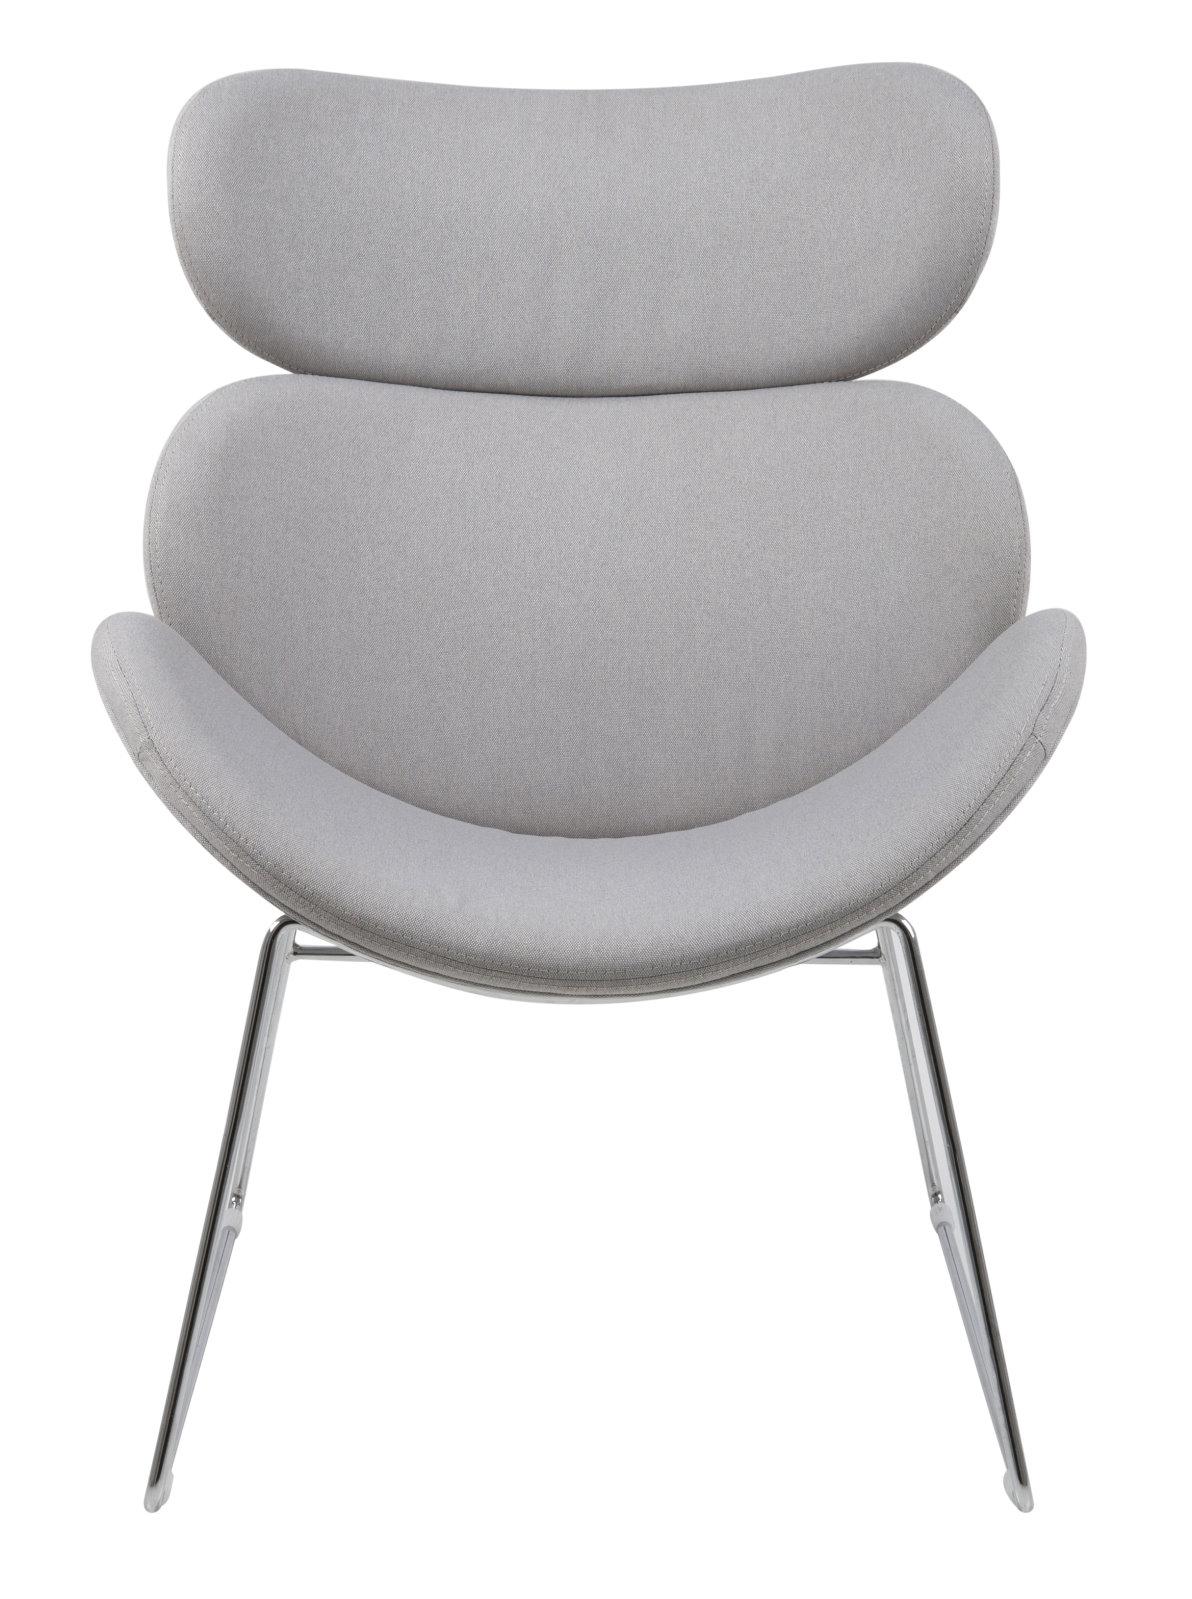 pkline relaxsessel cazy in hellgrau sessel ruhesessel m bel wohnen st hle hocker. Black Bedroom Furniture Sets. Home Design Ideas